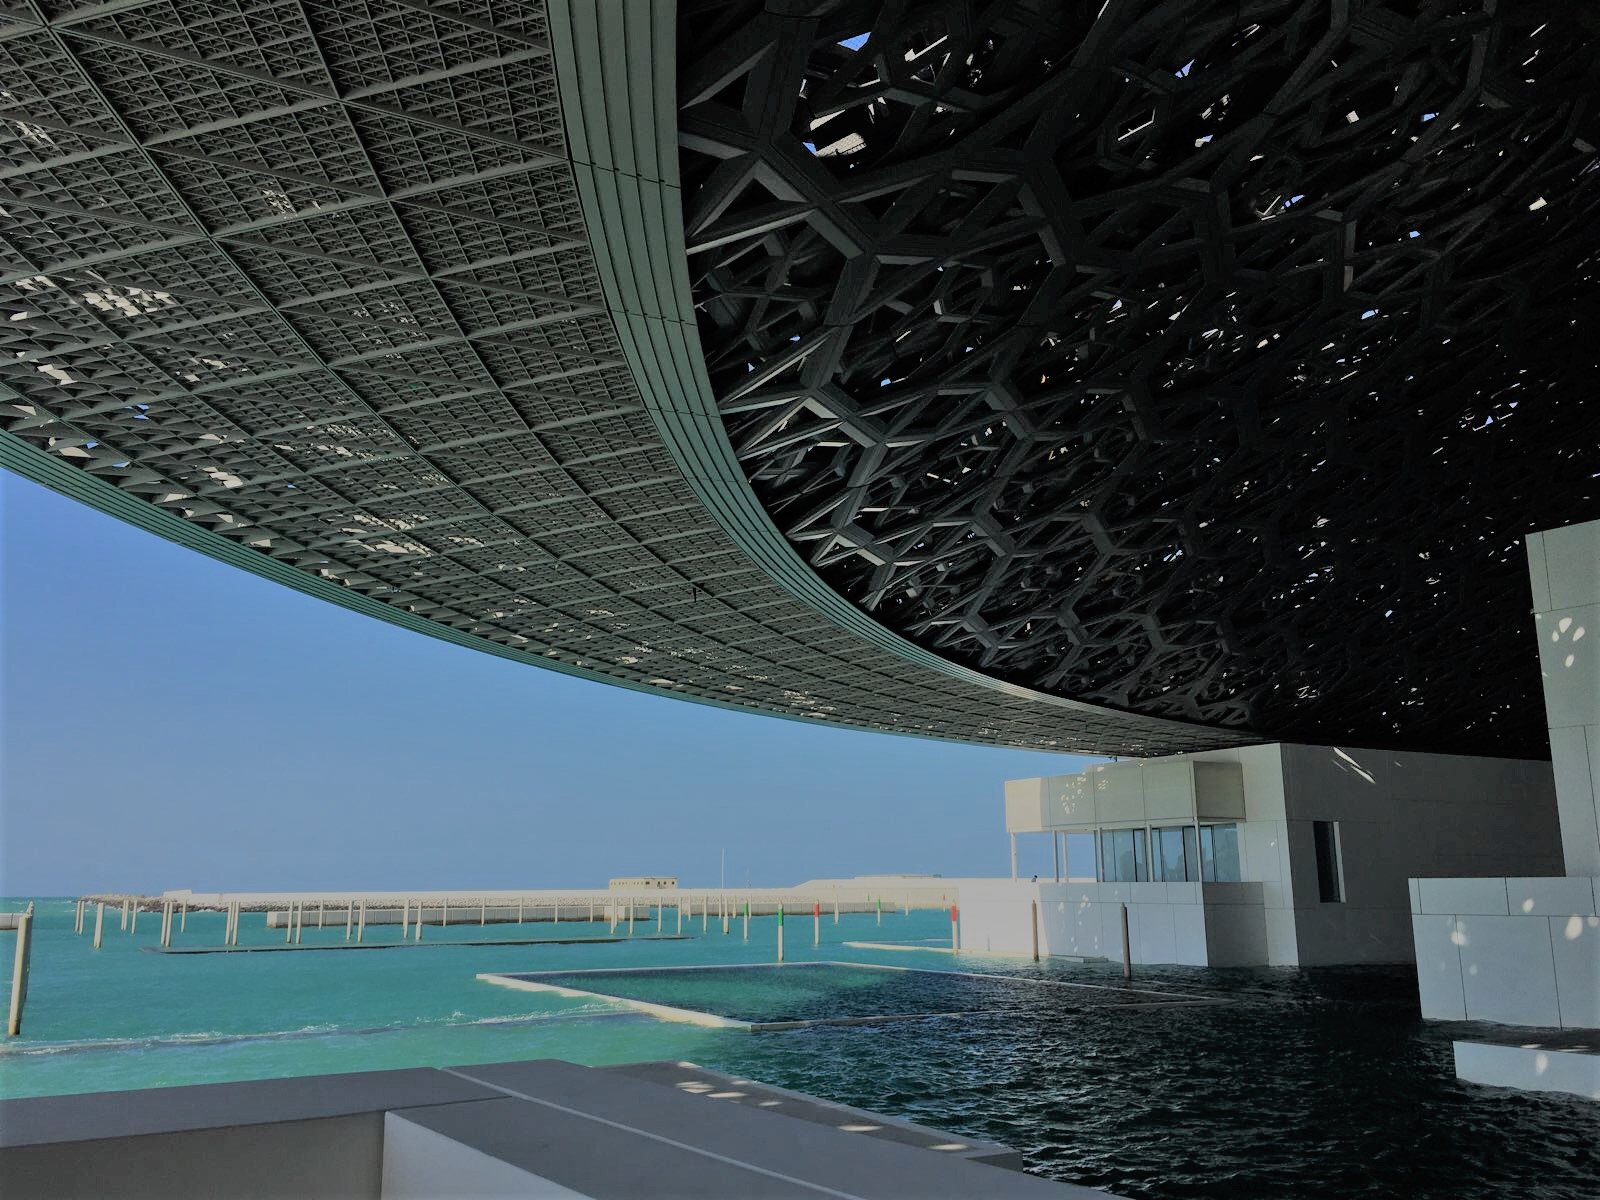 Louvre AD, Abu Dhabi